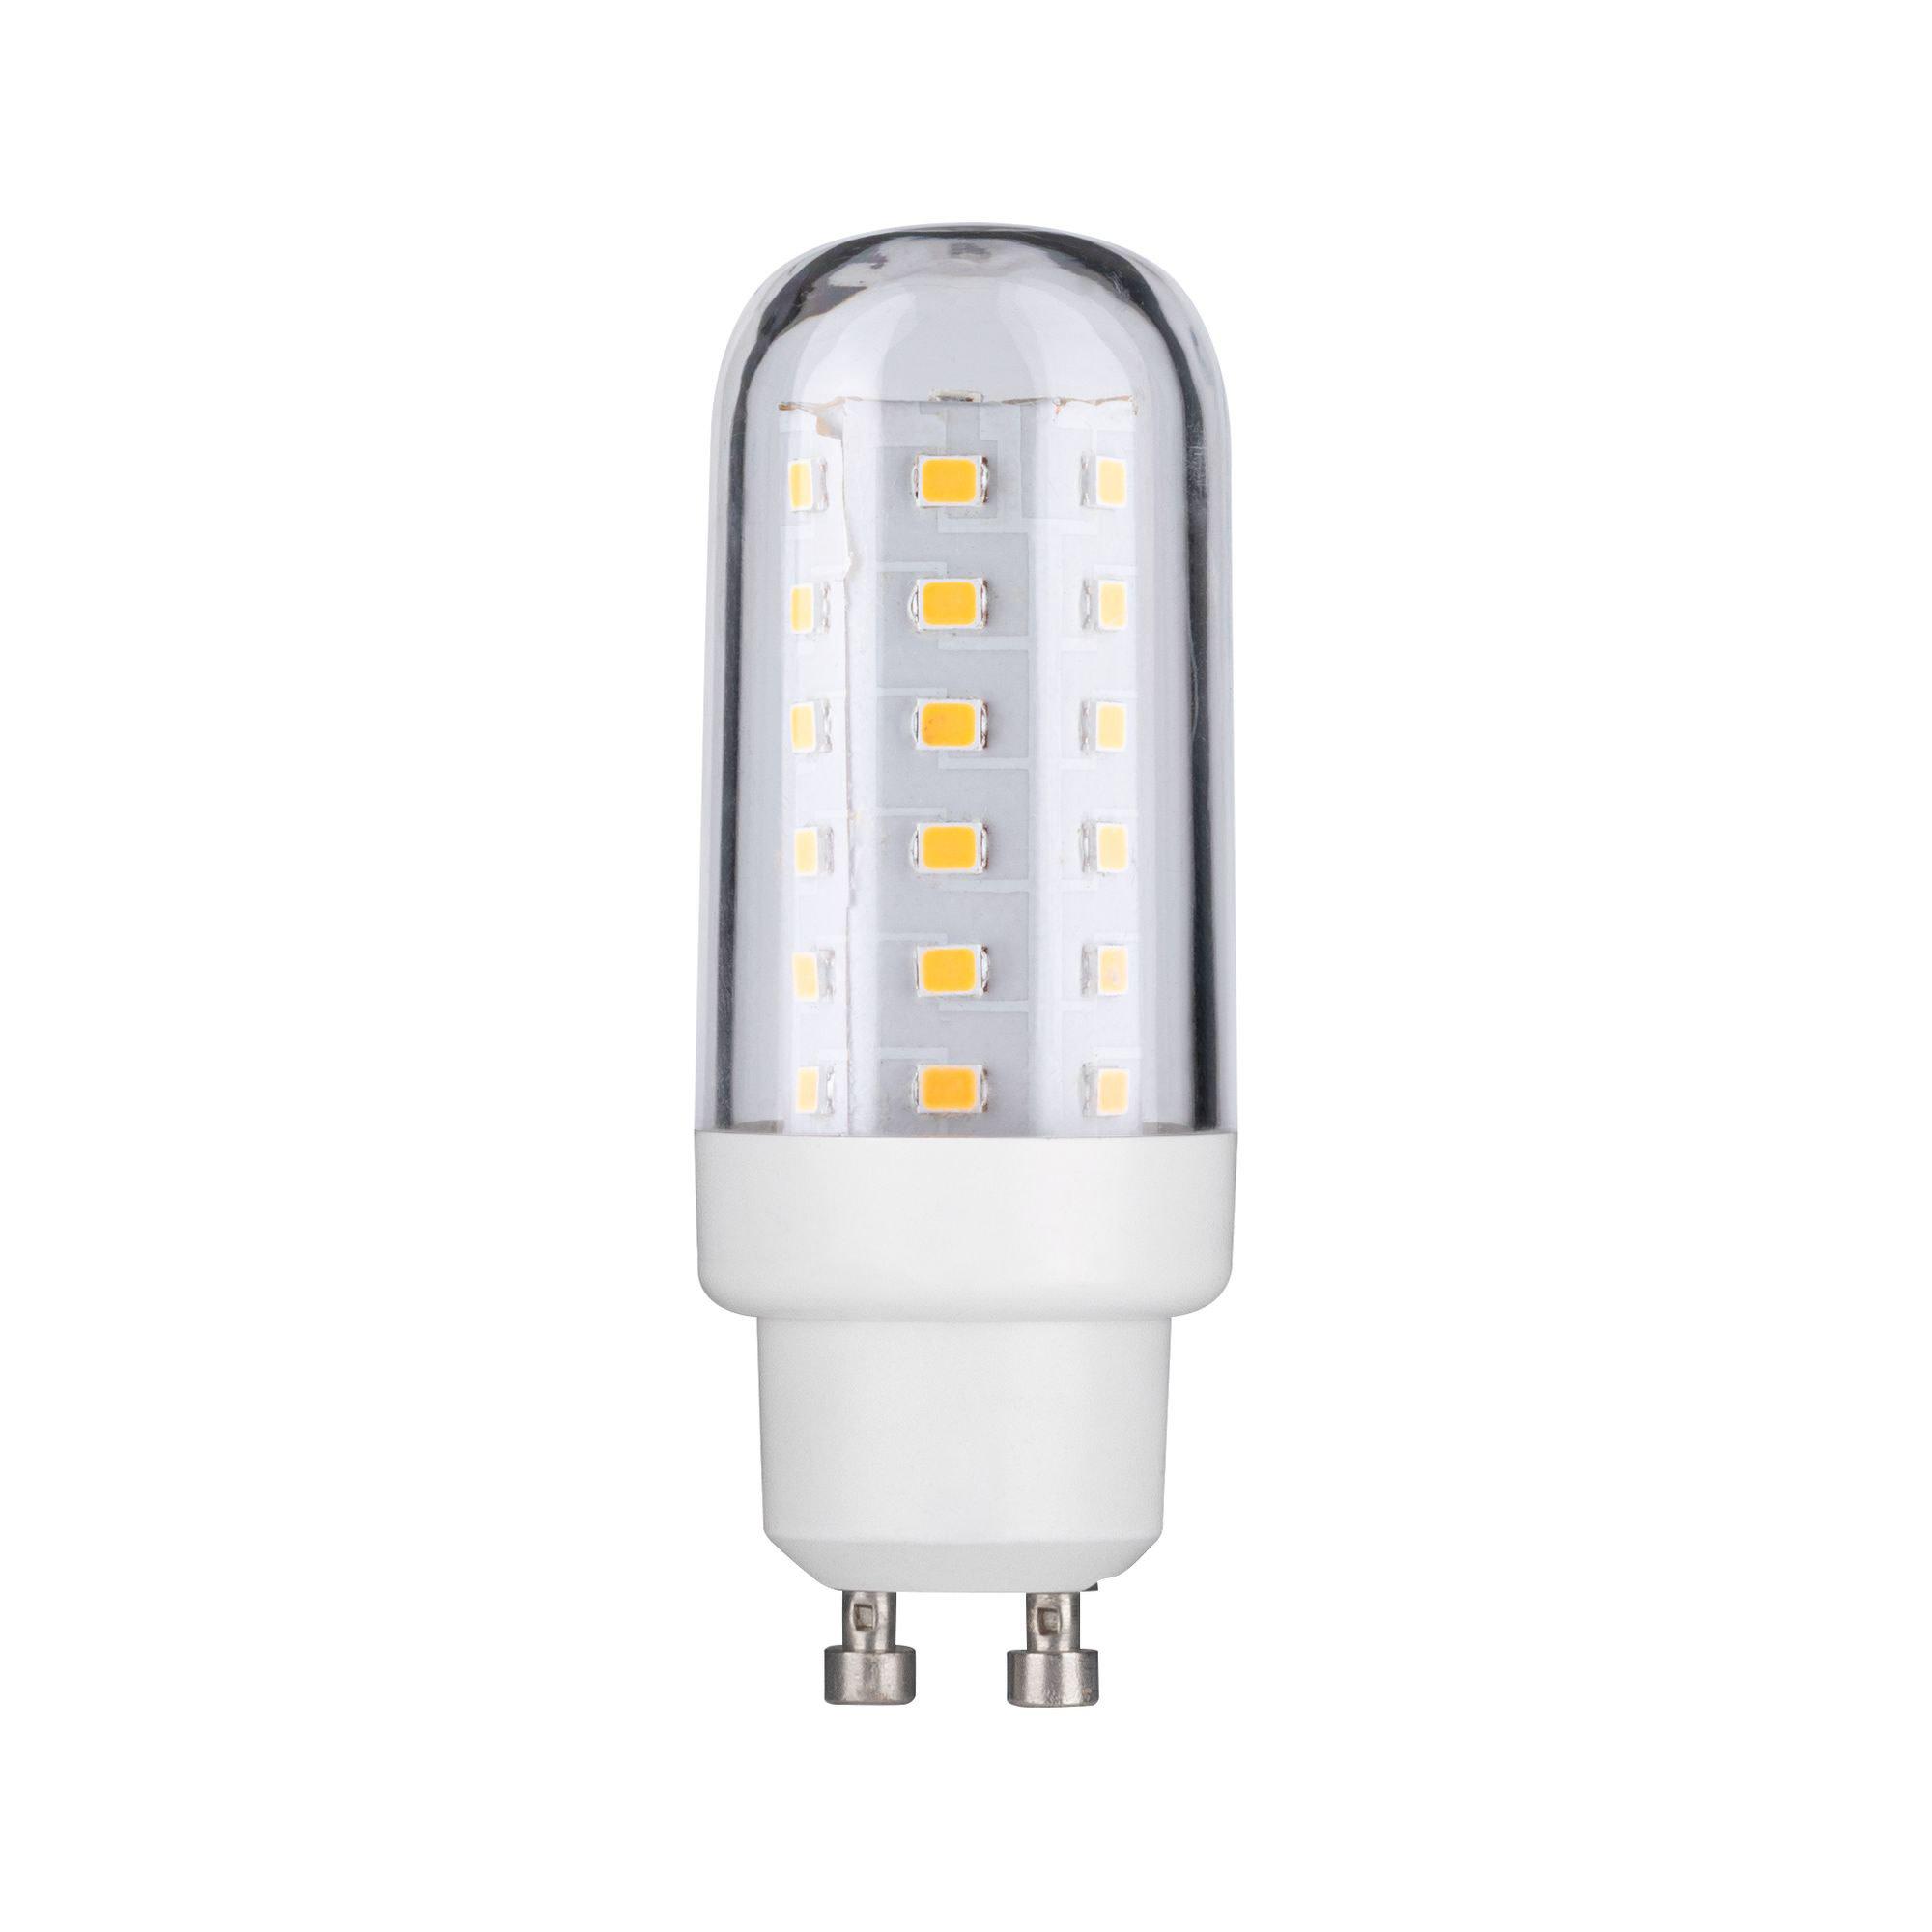 Лампа светодиодная Paulmann 28224 GU10 250 Лм теплый свет